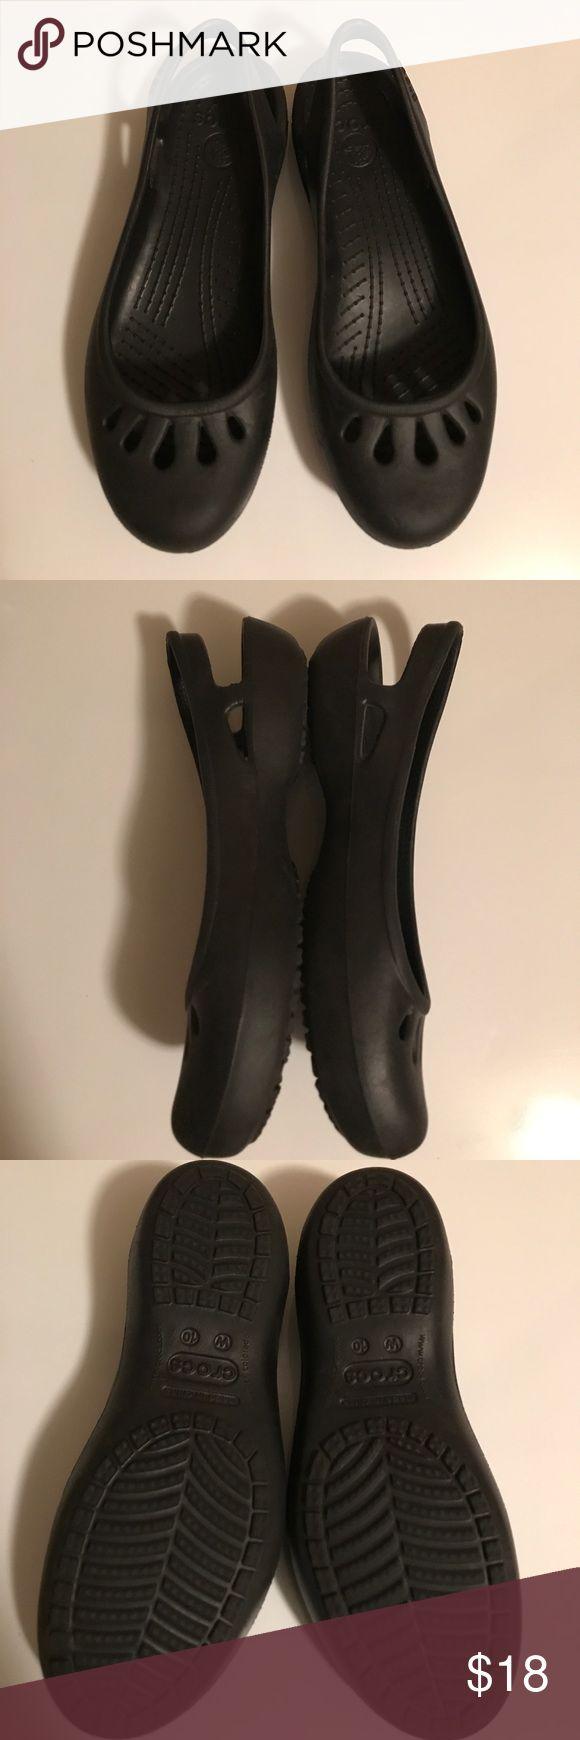 ✨Women's Crocs Kadee Work Flats✨ The Kadee Work Flat is a lightweight, versatile flat based on one of Crocs' most popular women's styles. Heel cutouts help with breathability. Size 10W CROCS Shoes Slippers